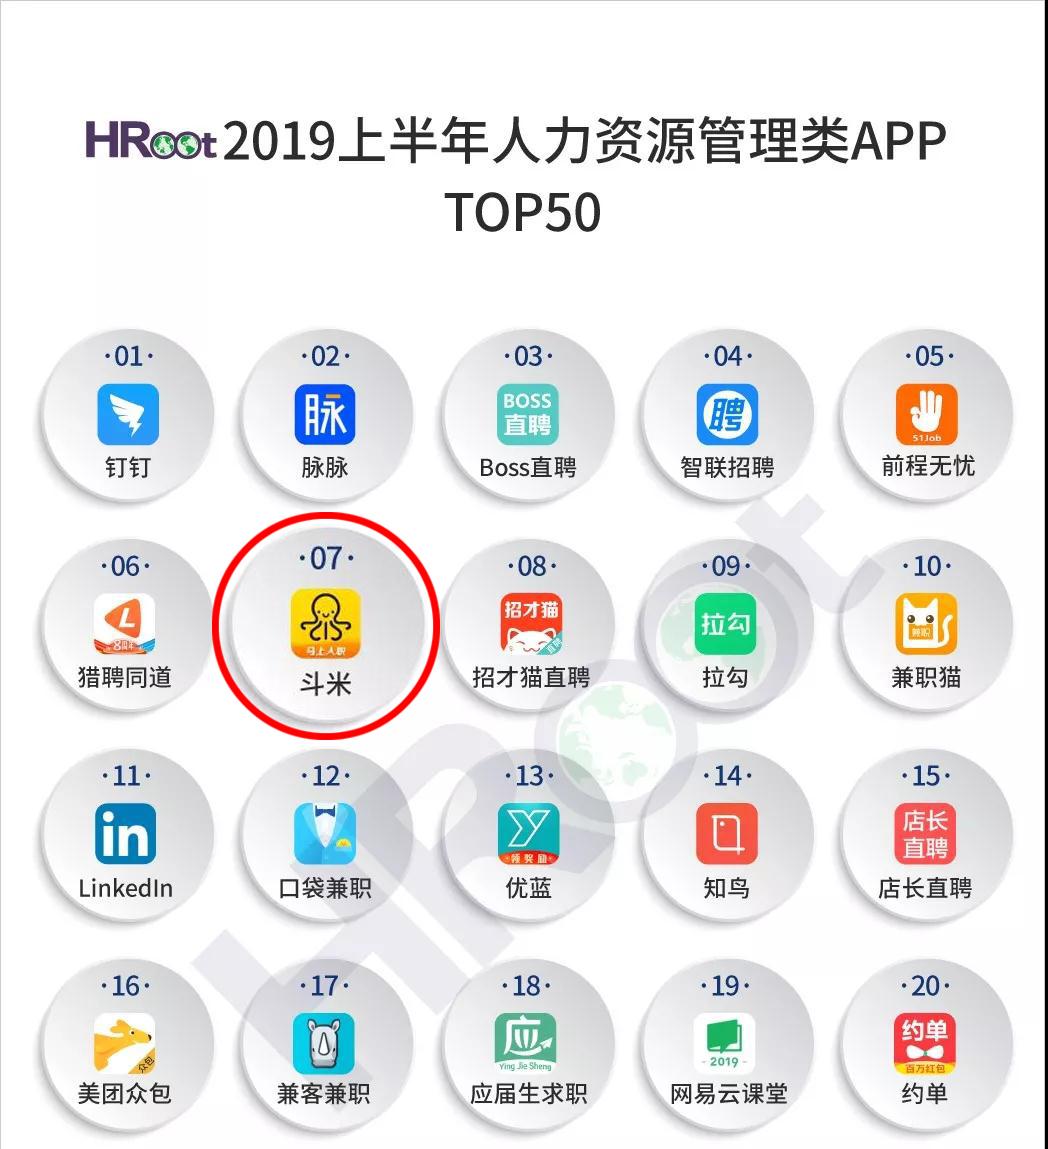 HRoot2019上半年人力资源管理类APP榜单发布,斗米稳居第一梯队